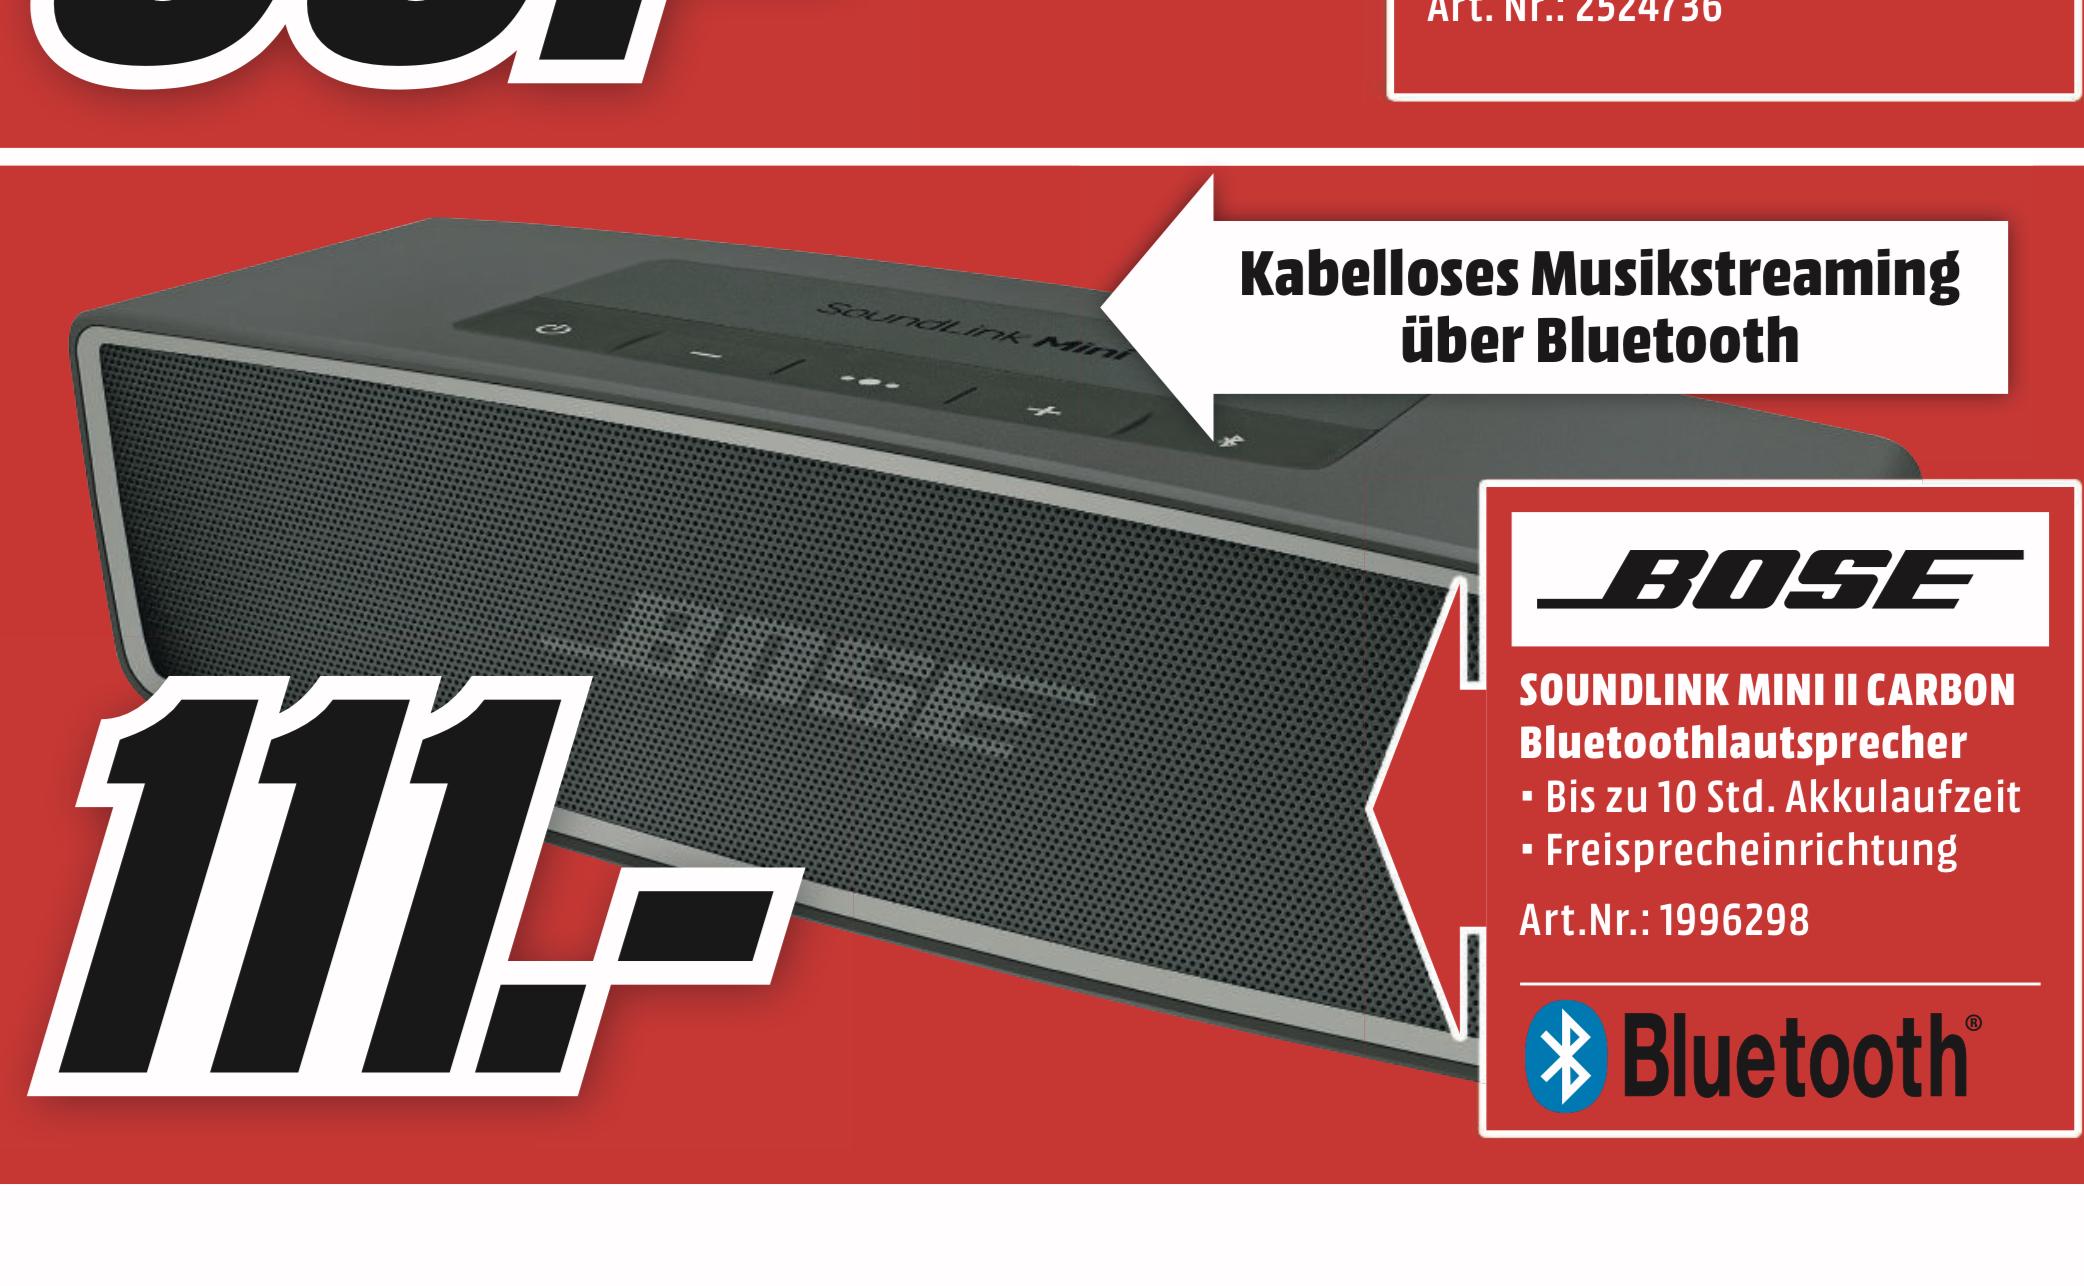 Lokal MediaMarkt Paderborn u. Elmshorn: Bose SoundLink Mini II für 111€